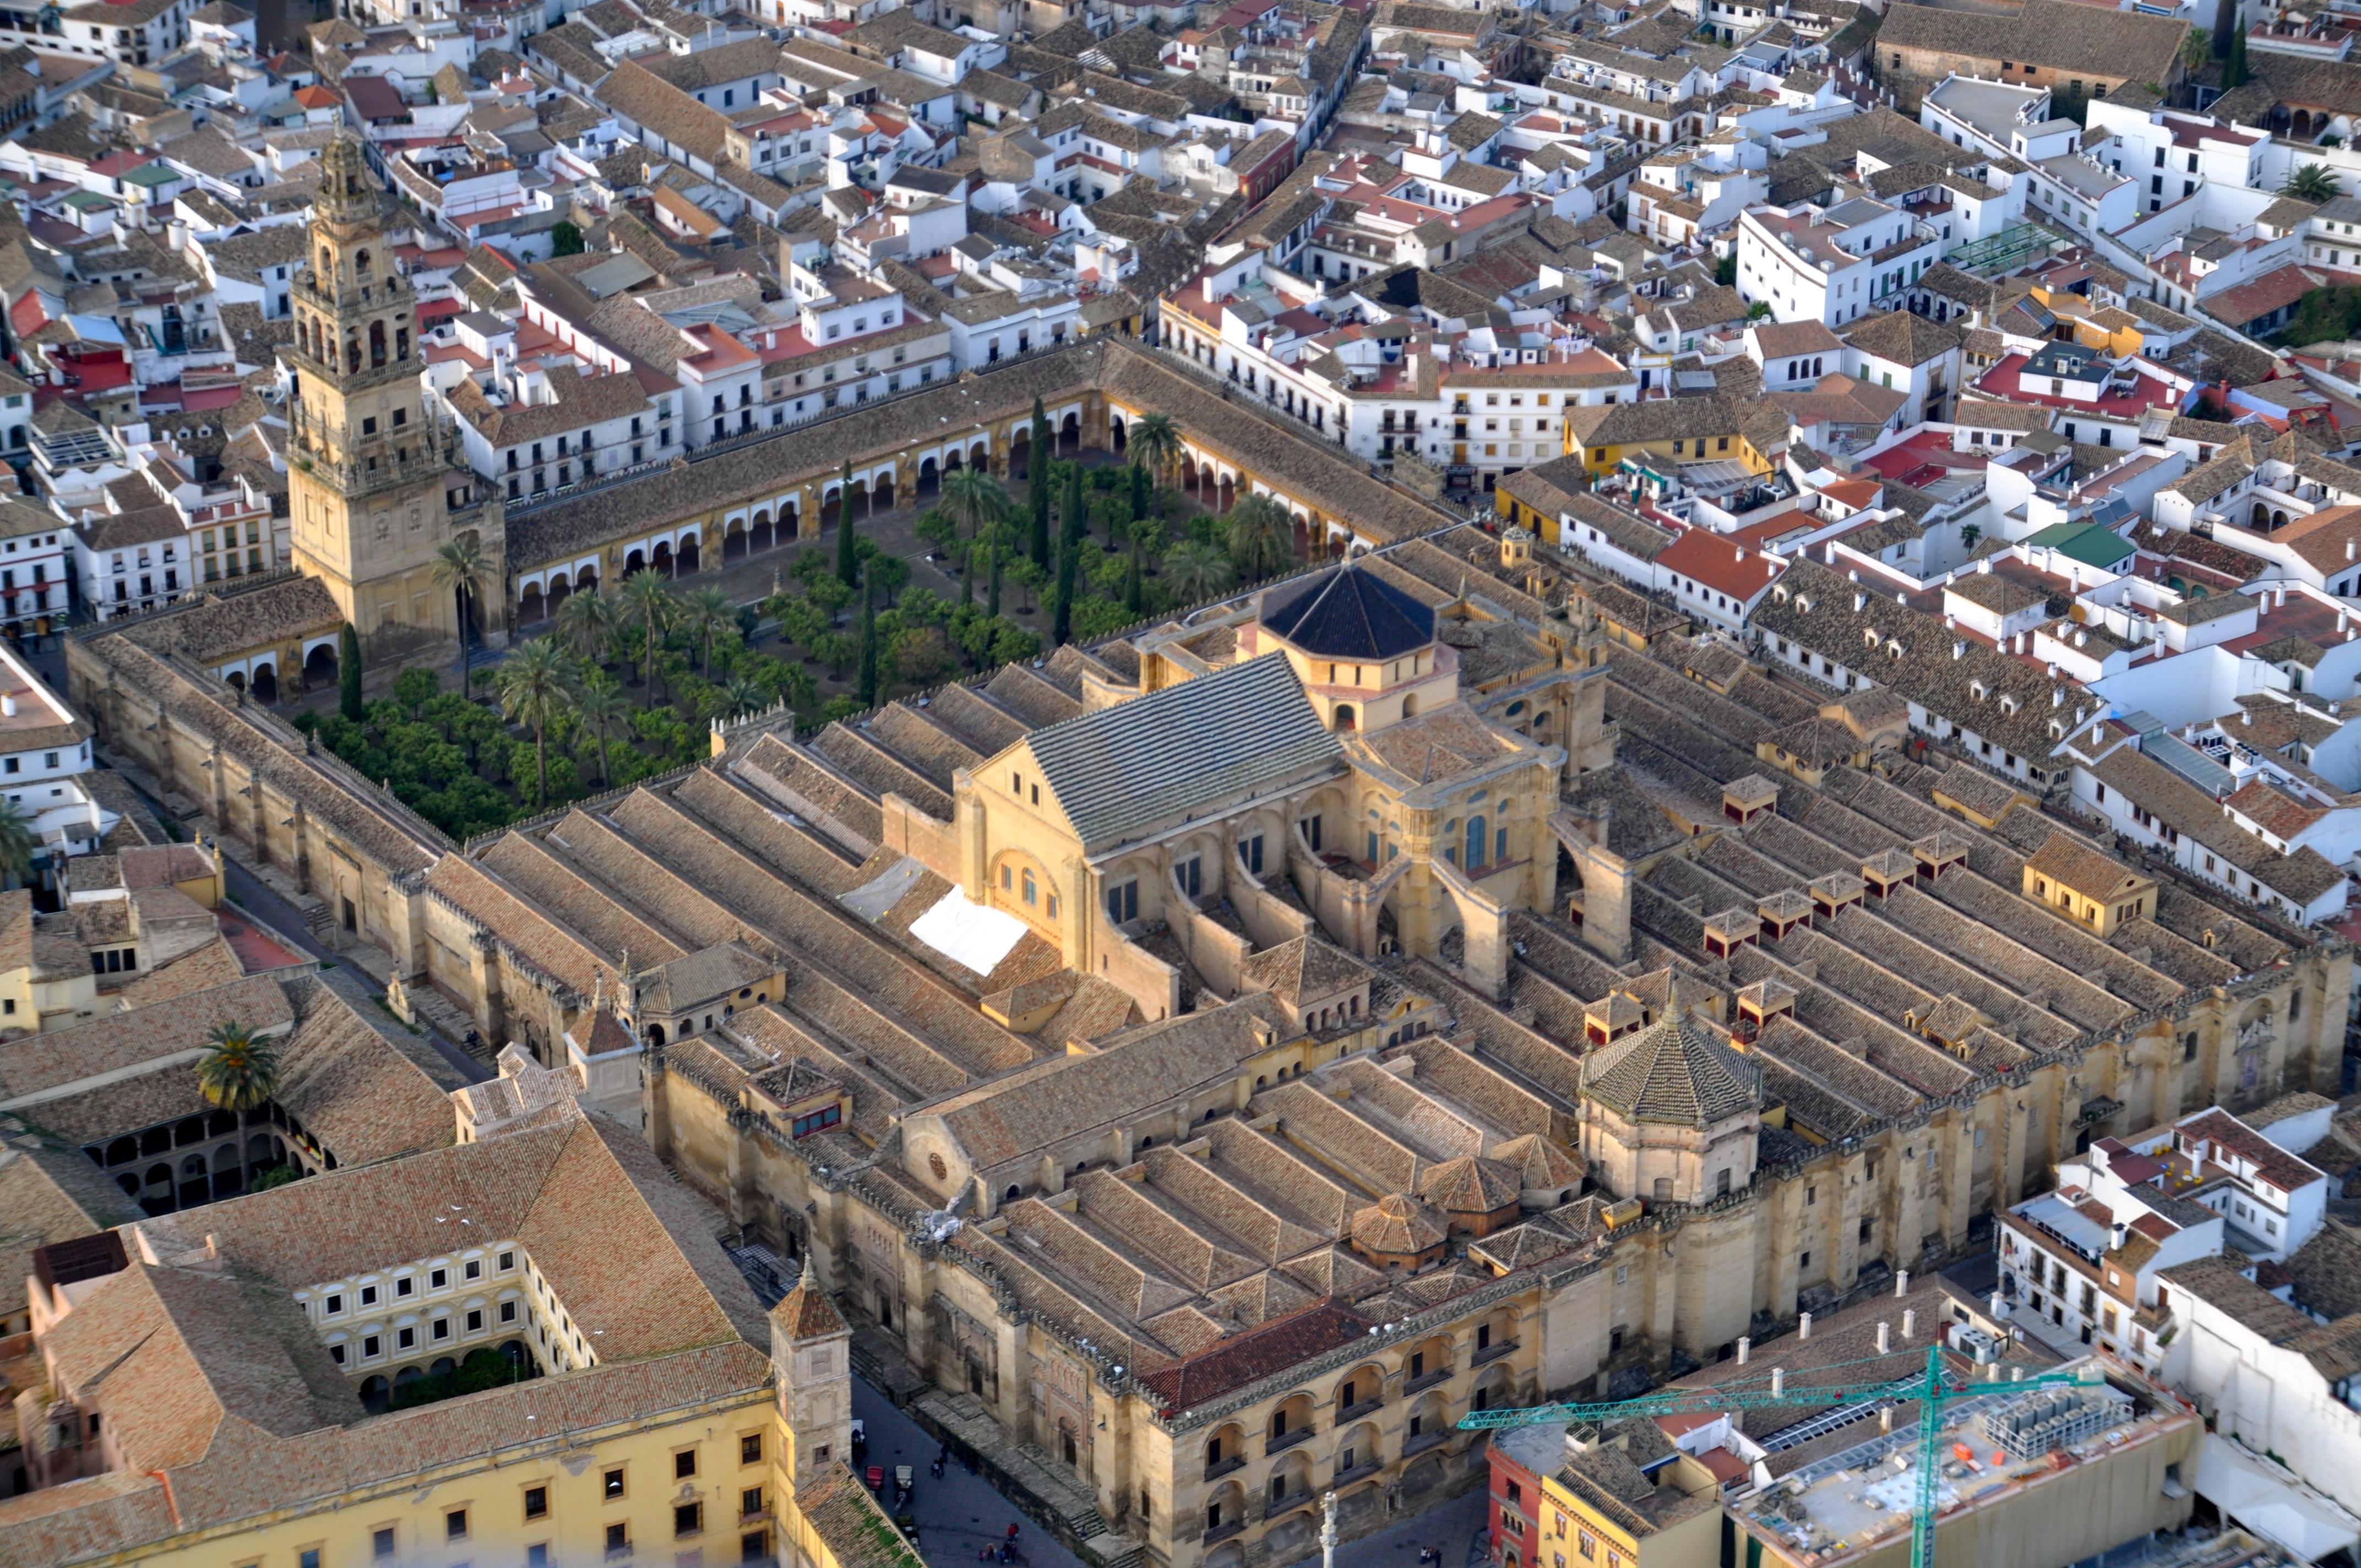 File:Mezquita de Córdoba desde el aire (Córdoba, España ...